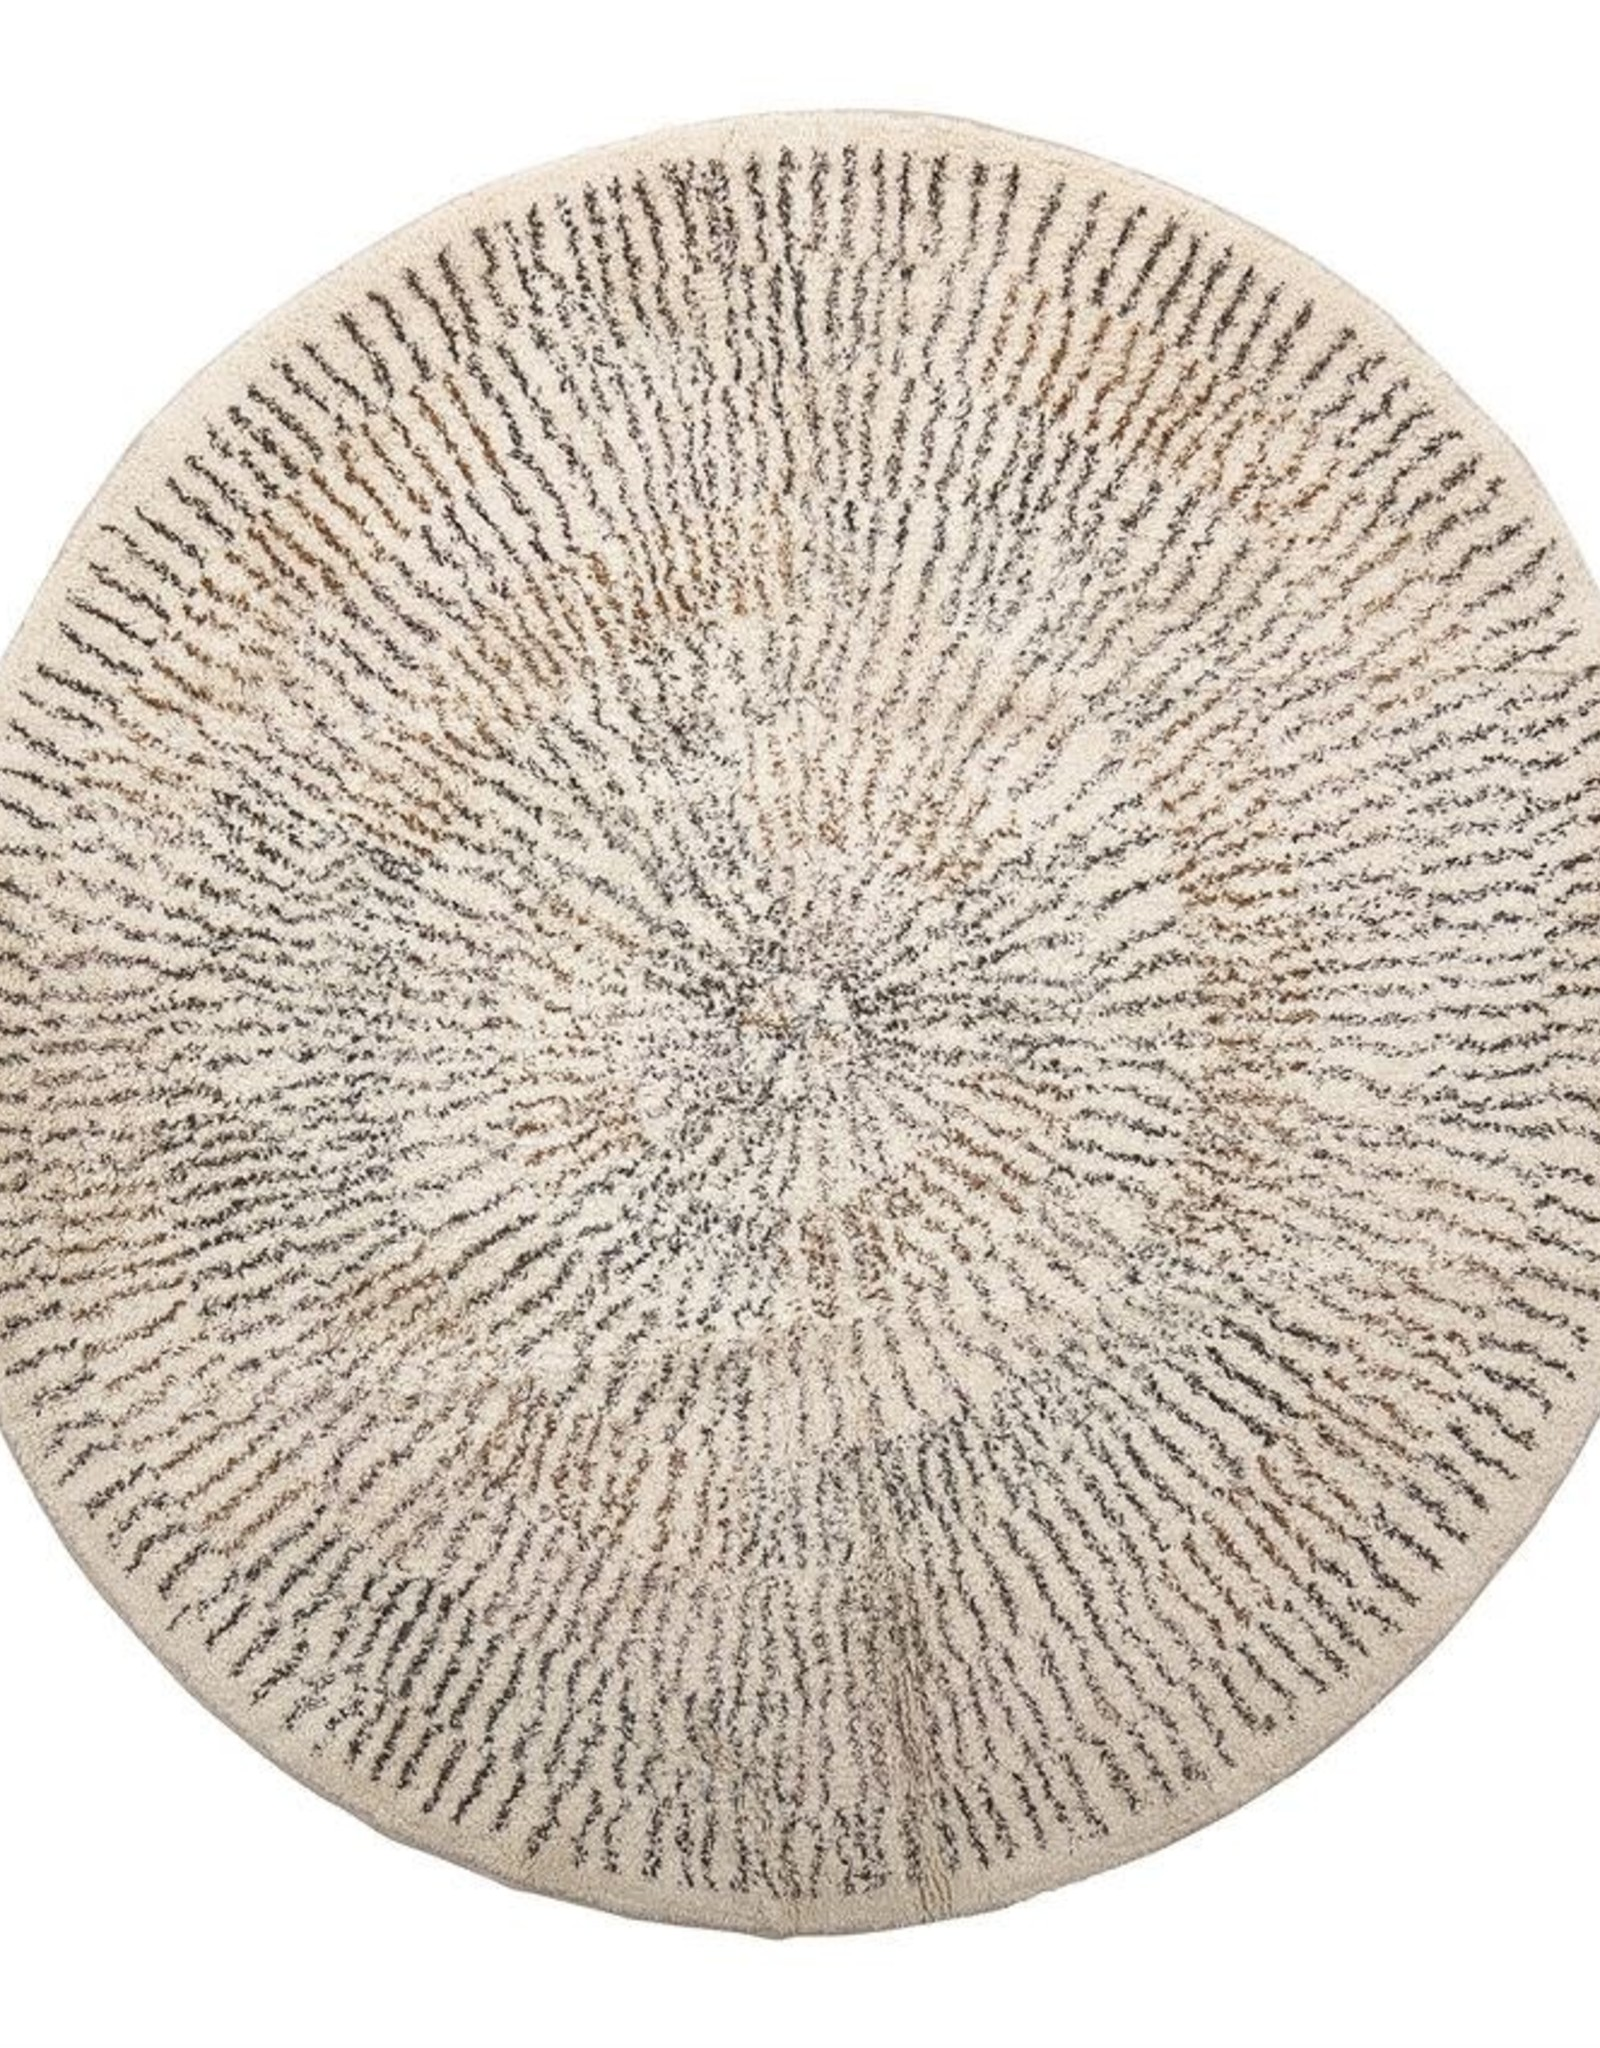 Round Multi Color Cotton Rug